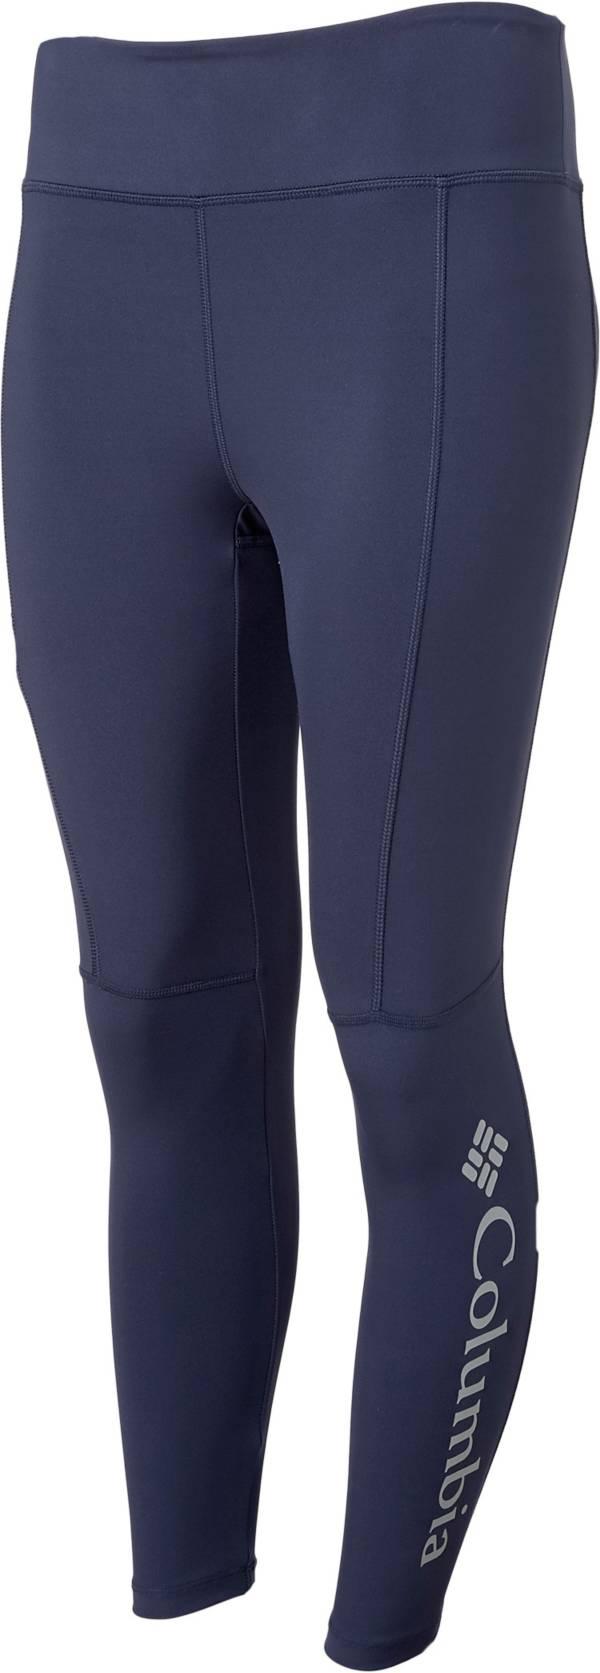 Columbia Women's Windgates 7/8 Leggings product image